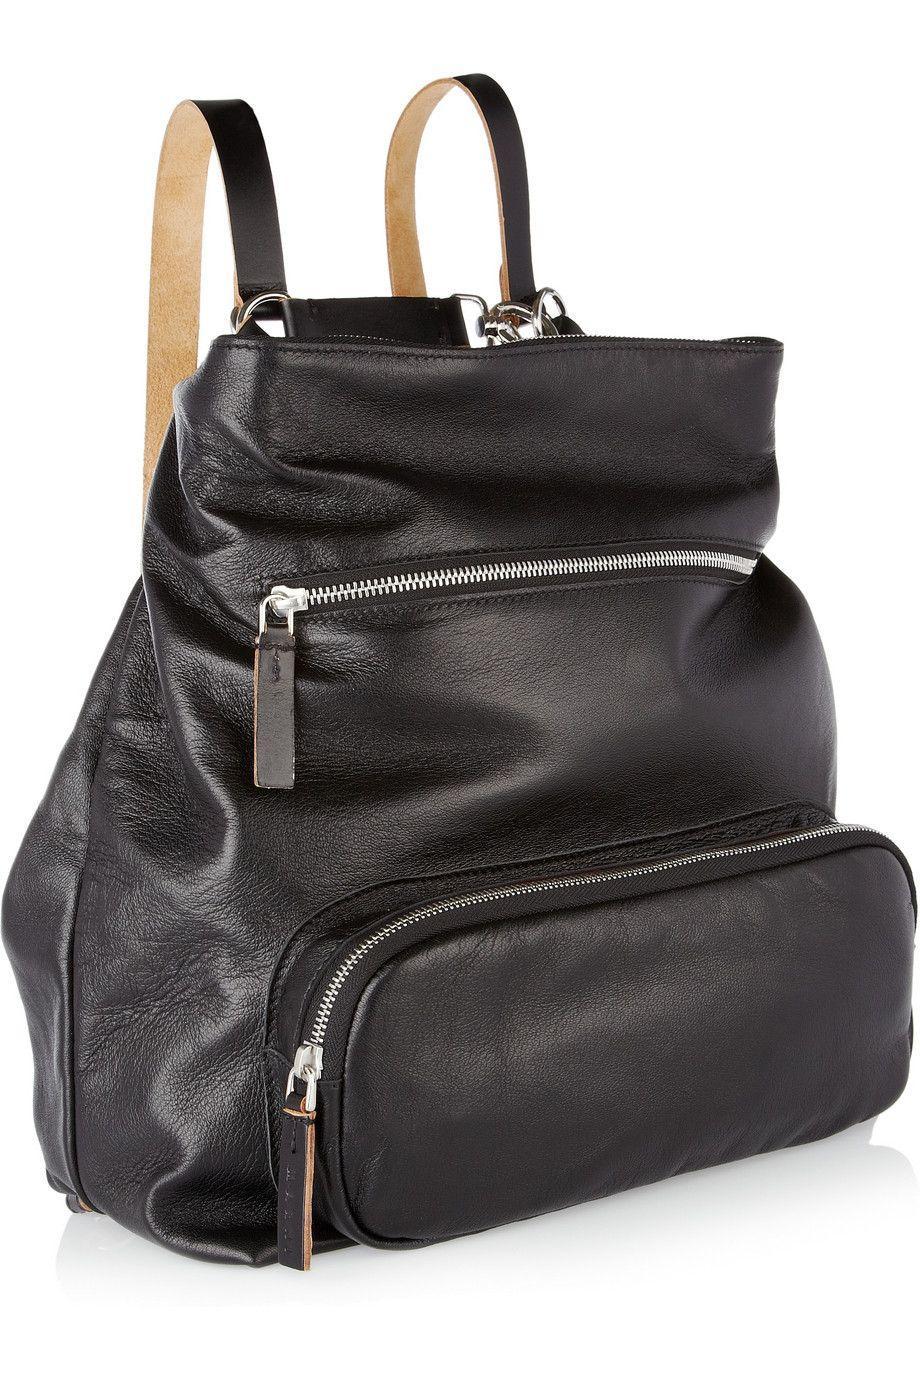 Marni - Convertible leather shoulder bag